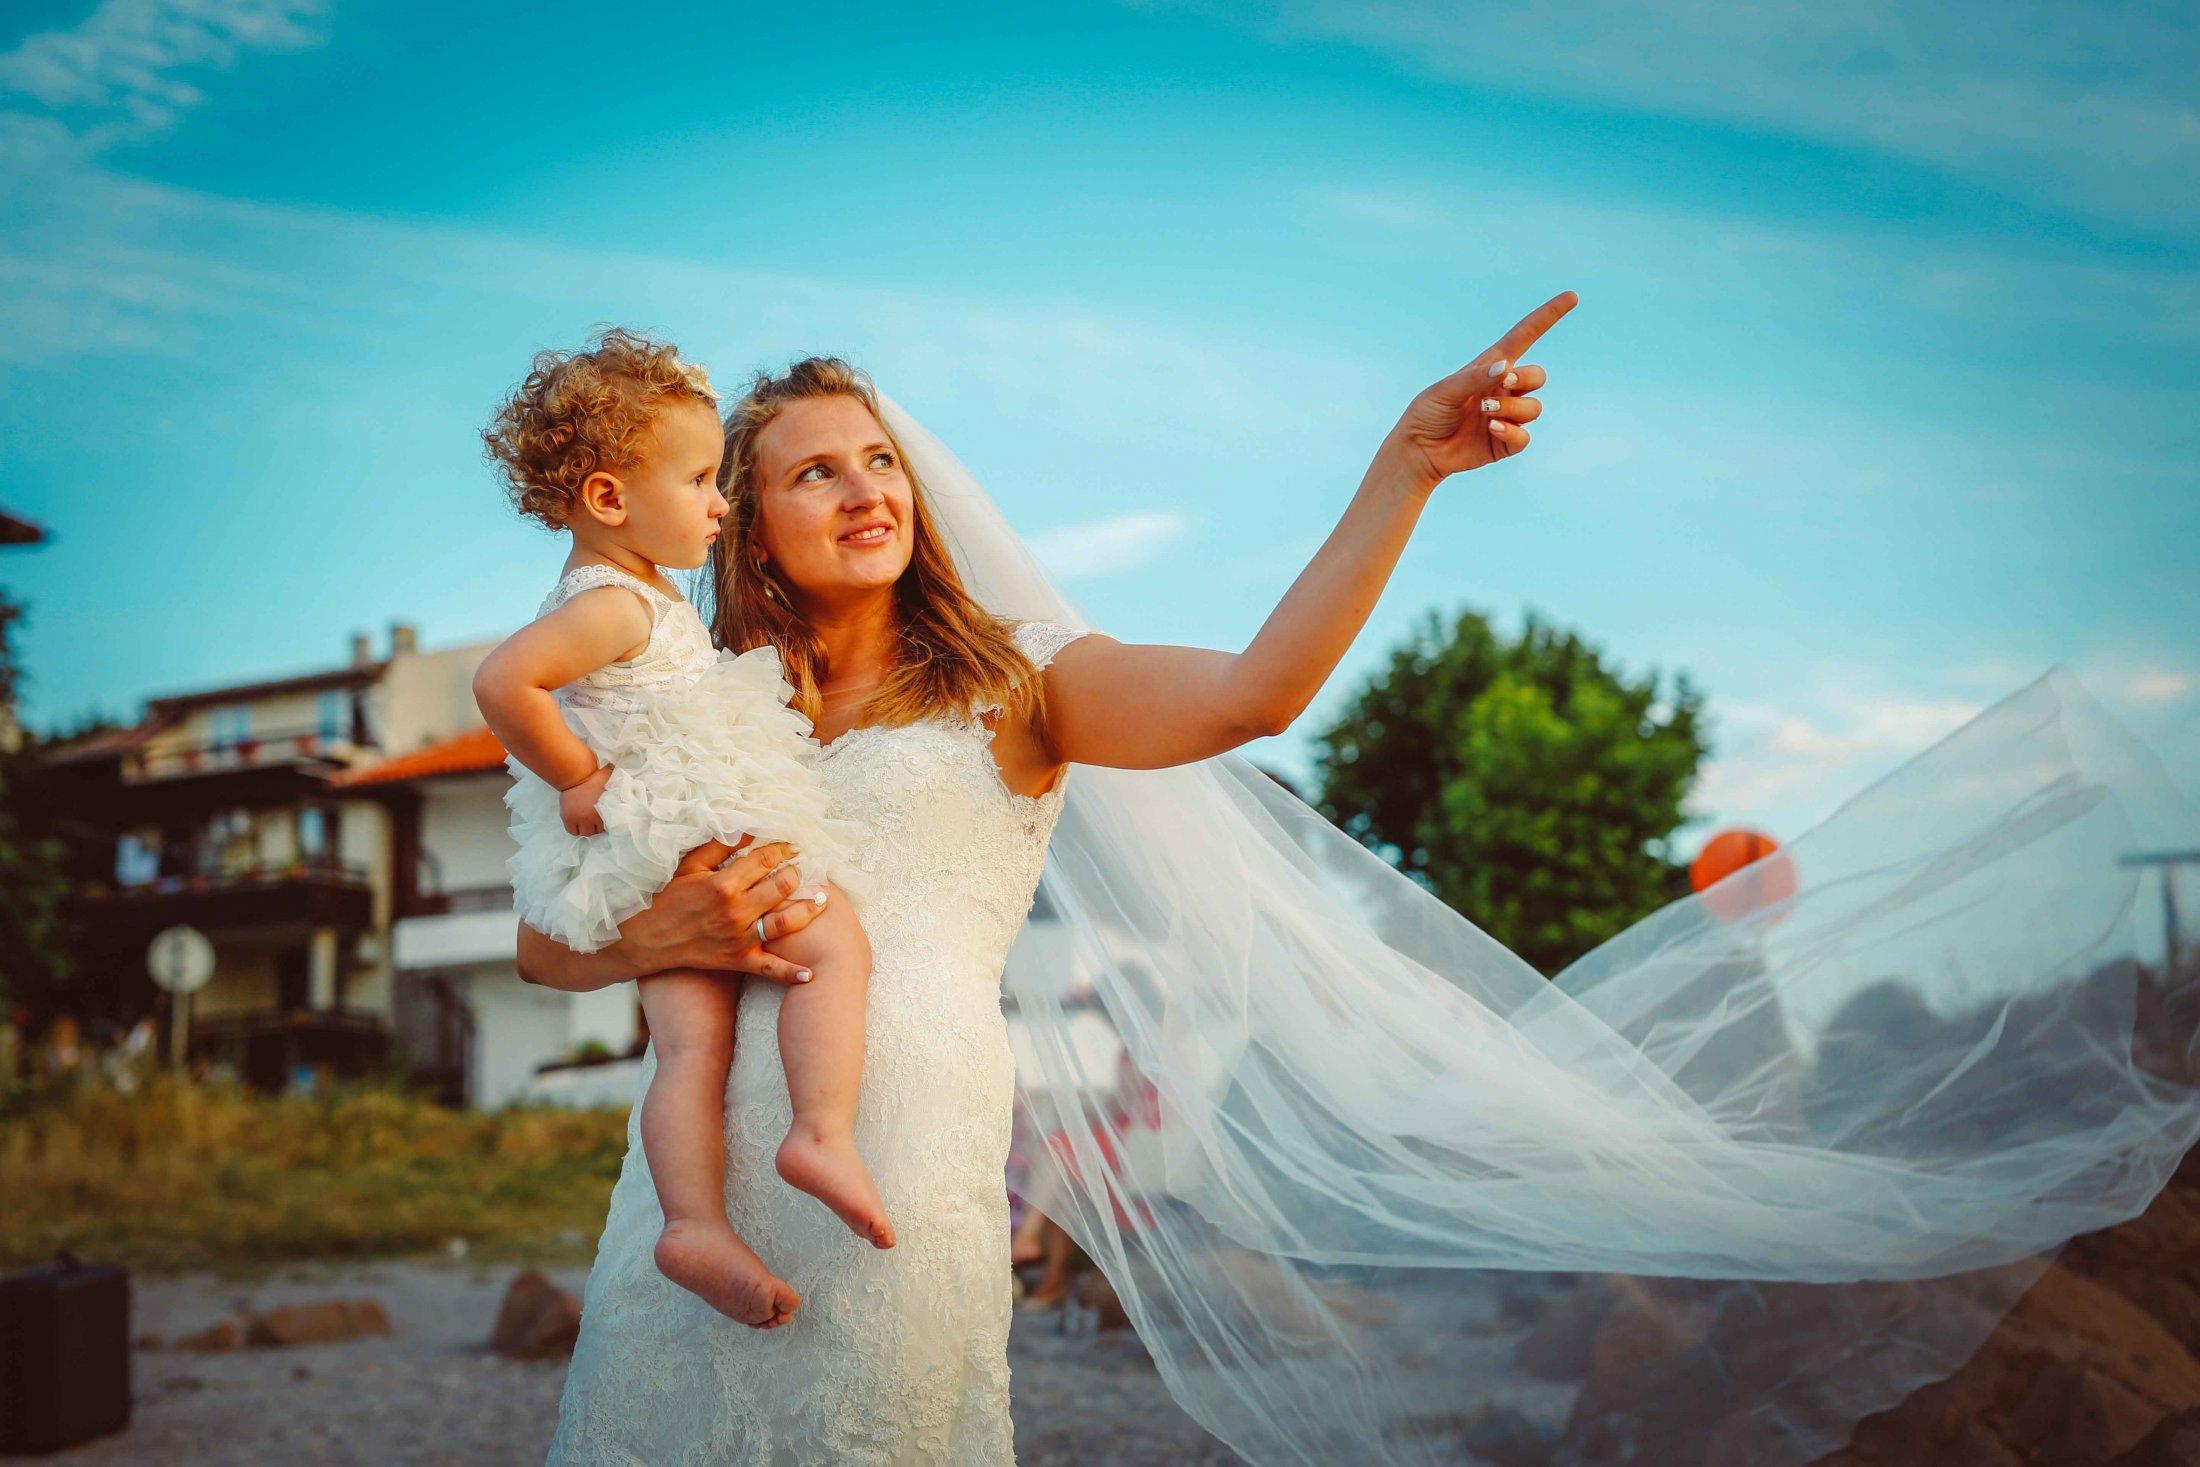 Сватбата на Христо и Ана в Бургас - сватбен фотографот студио Скайвю, Пловдив